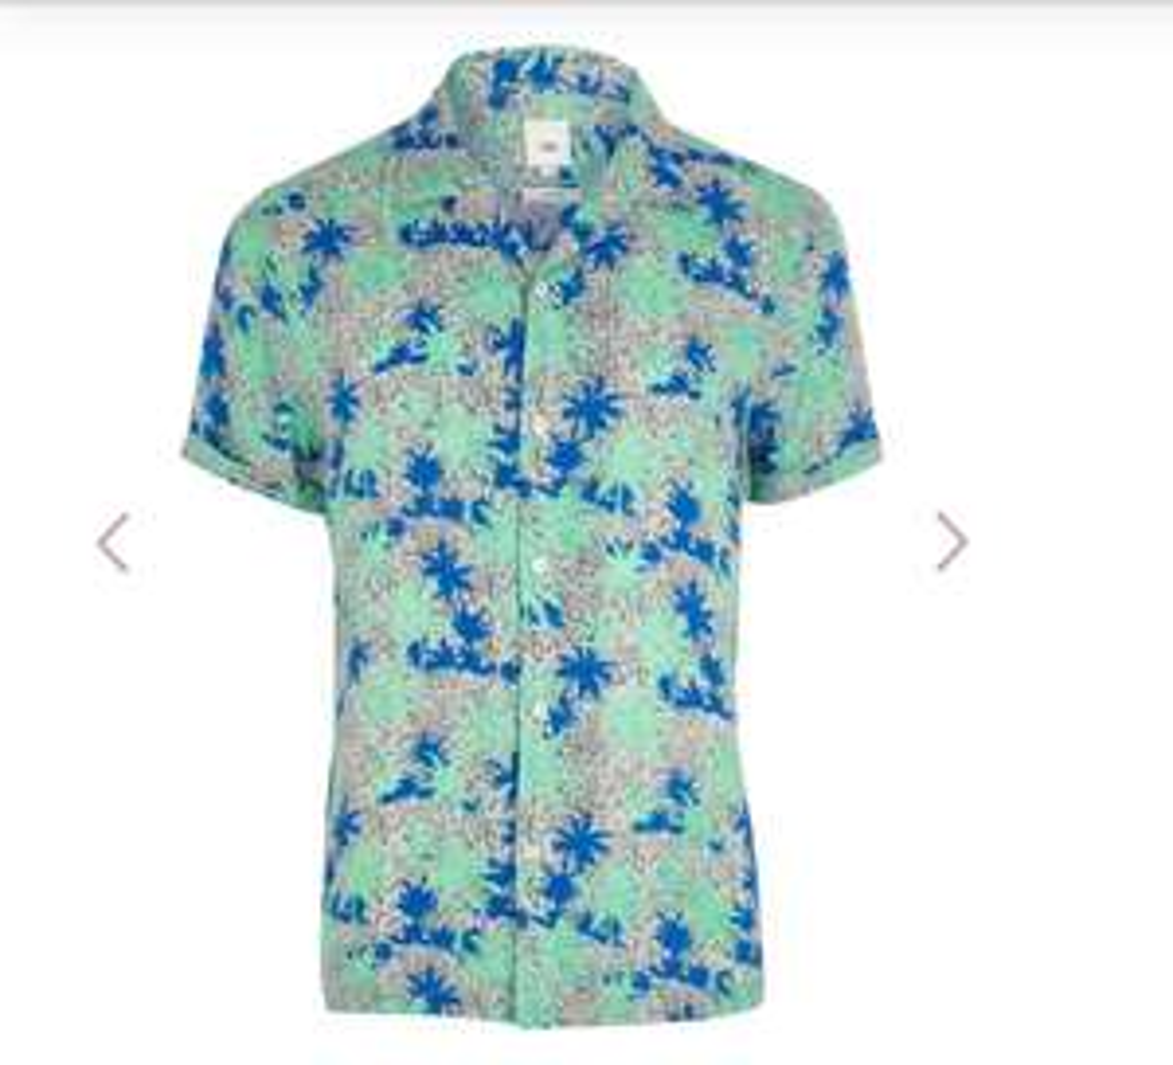 Men's River Island Palm tree shirt £5 - Free c&c